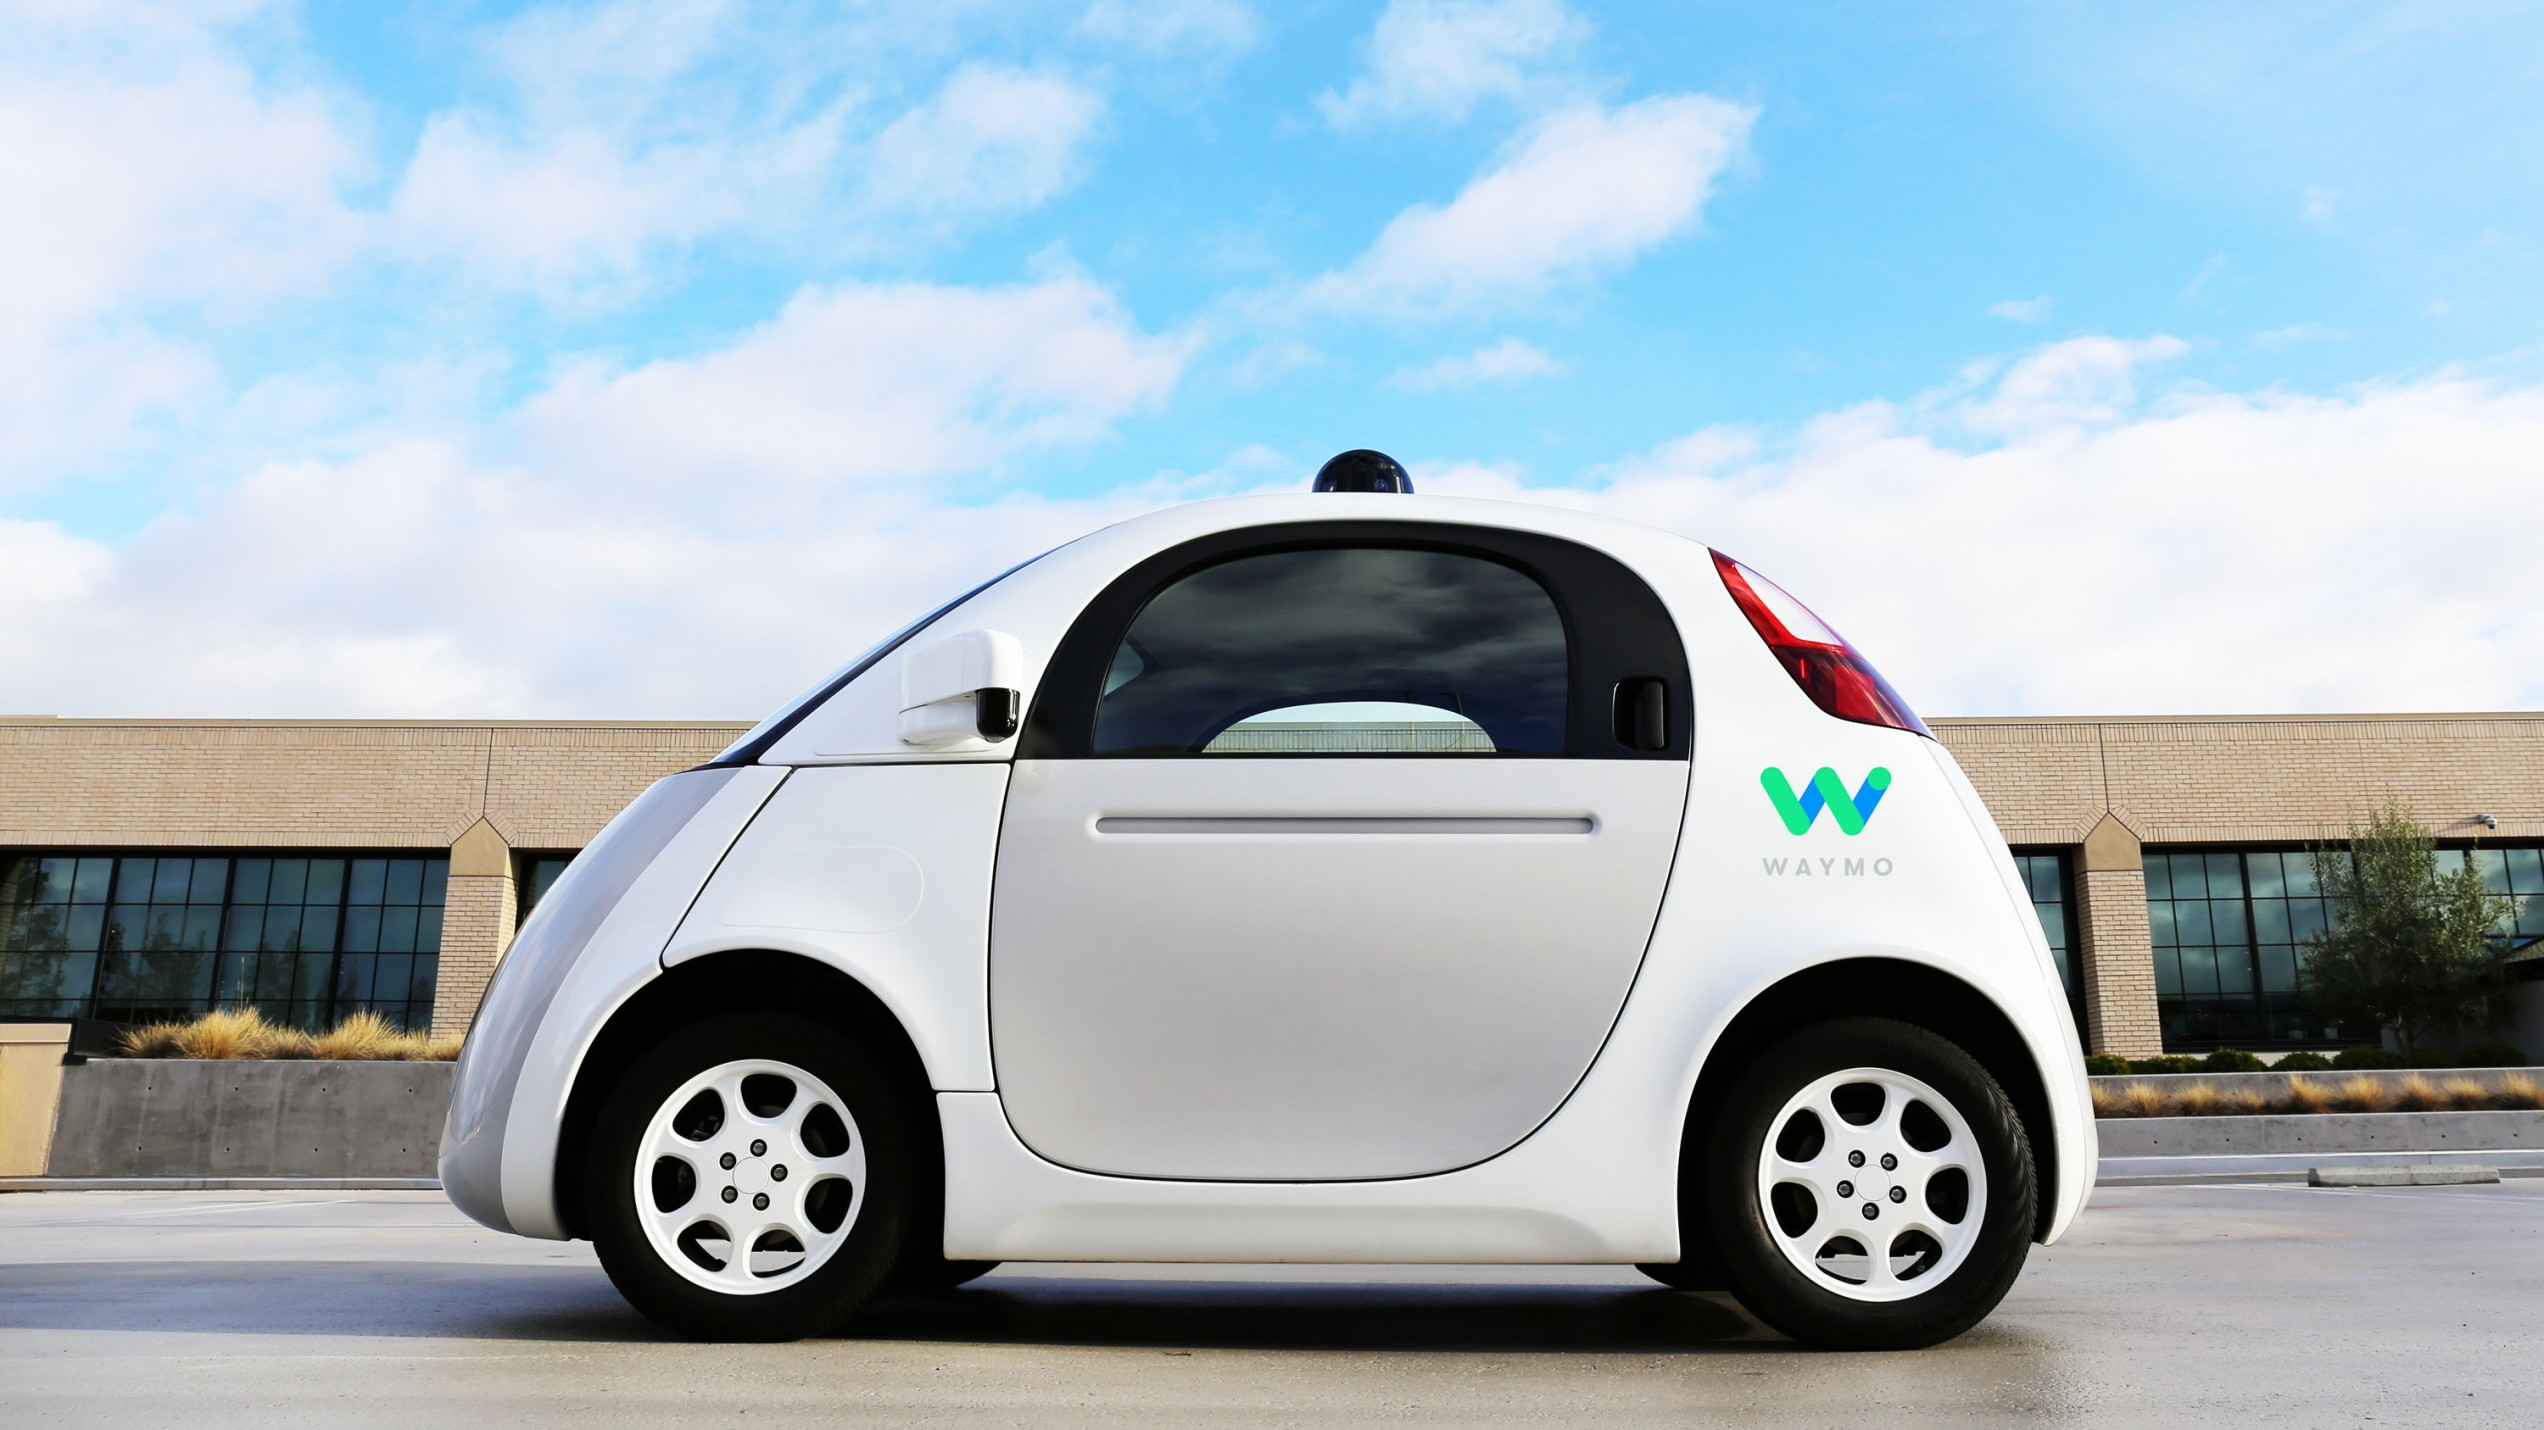 DeepMind is helping Waymo evolve better self-driving AI algorithms